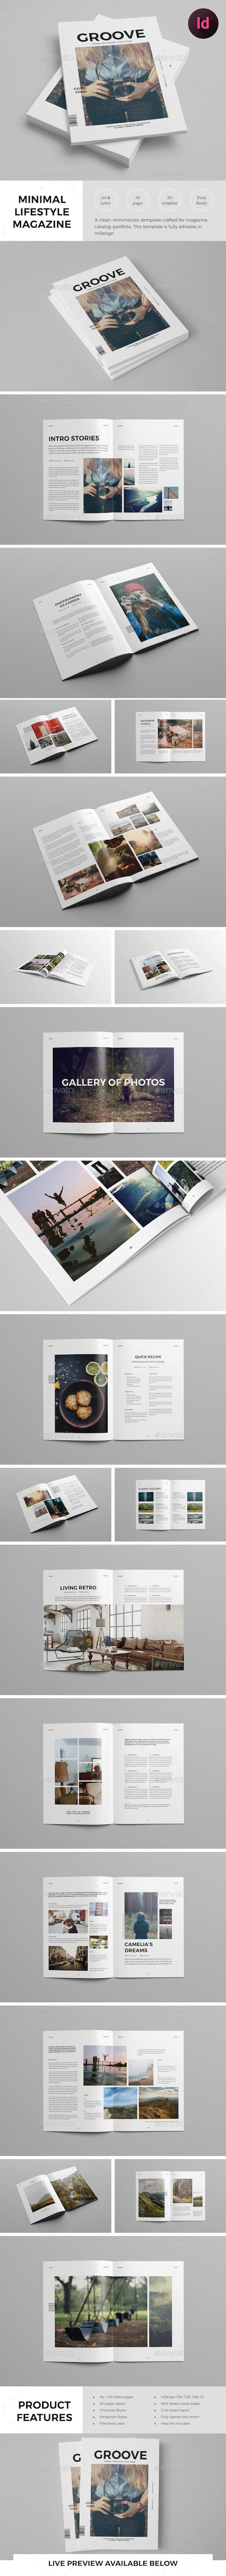 Simple Lifestyle Magazine template - Magazines Print Templates